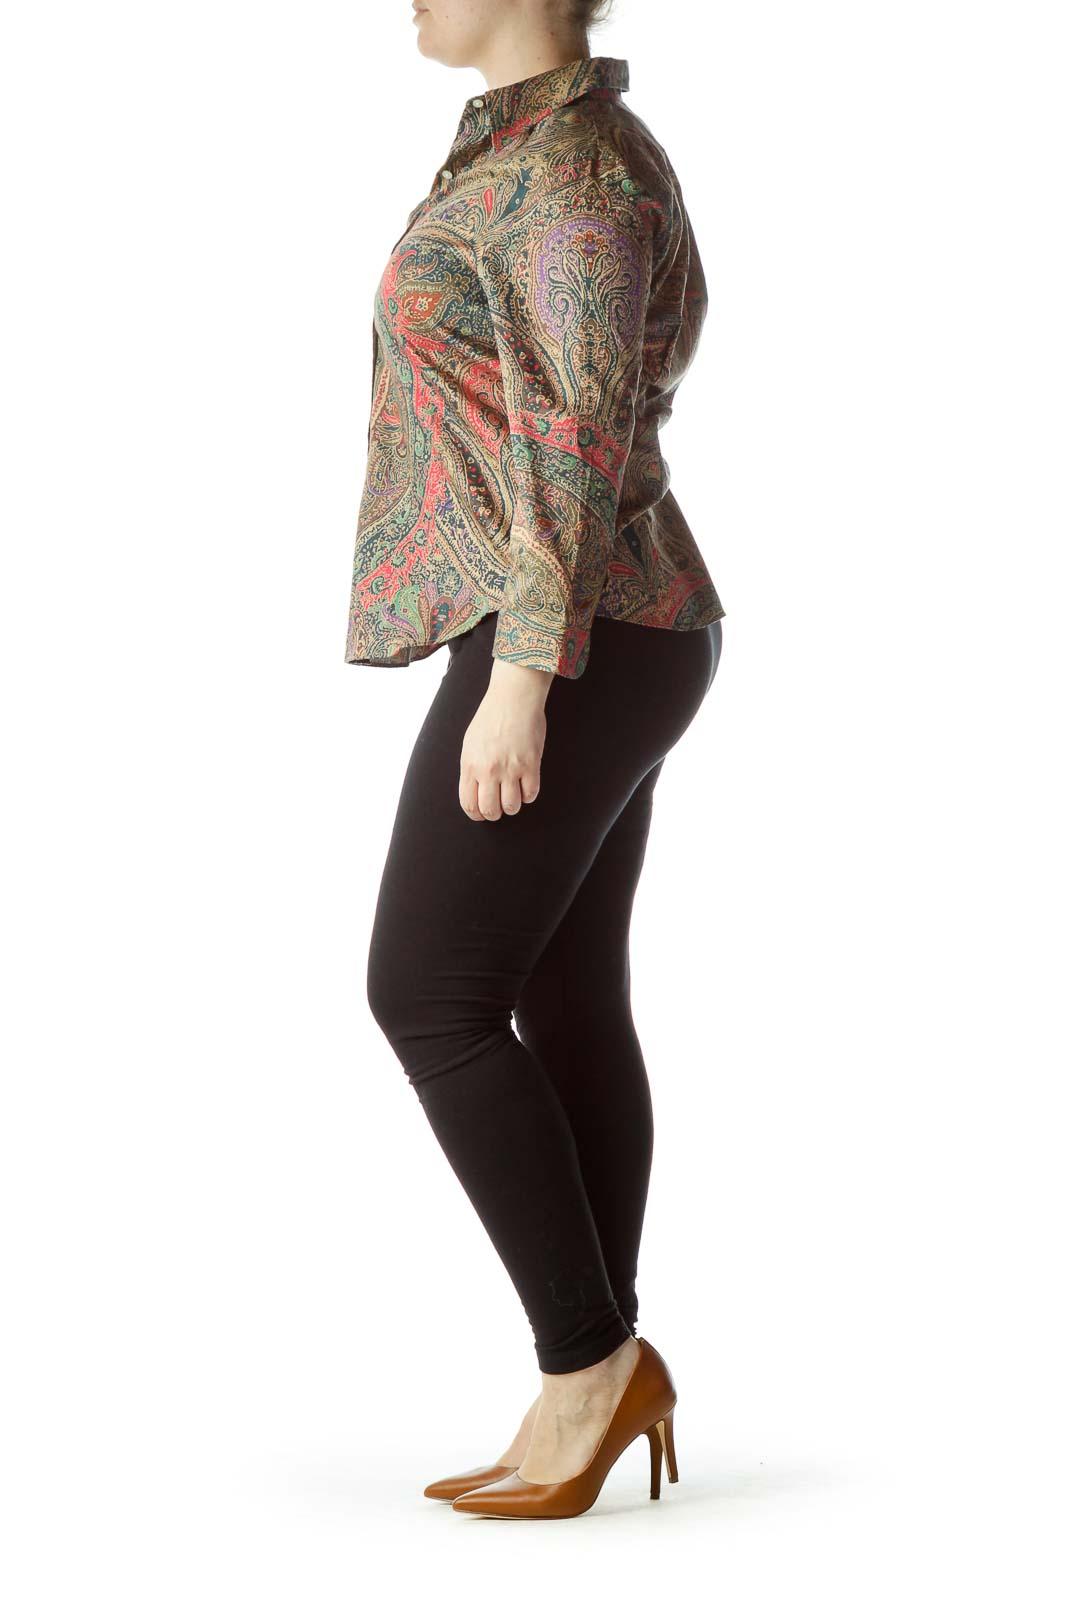 Multicolored Paisley Print 100% Cotton Shirt